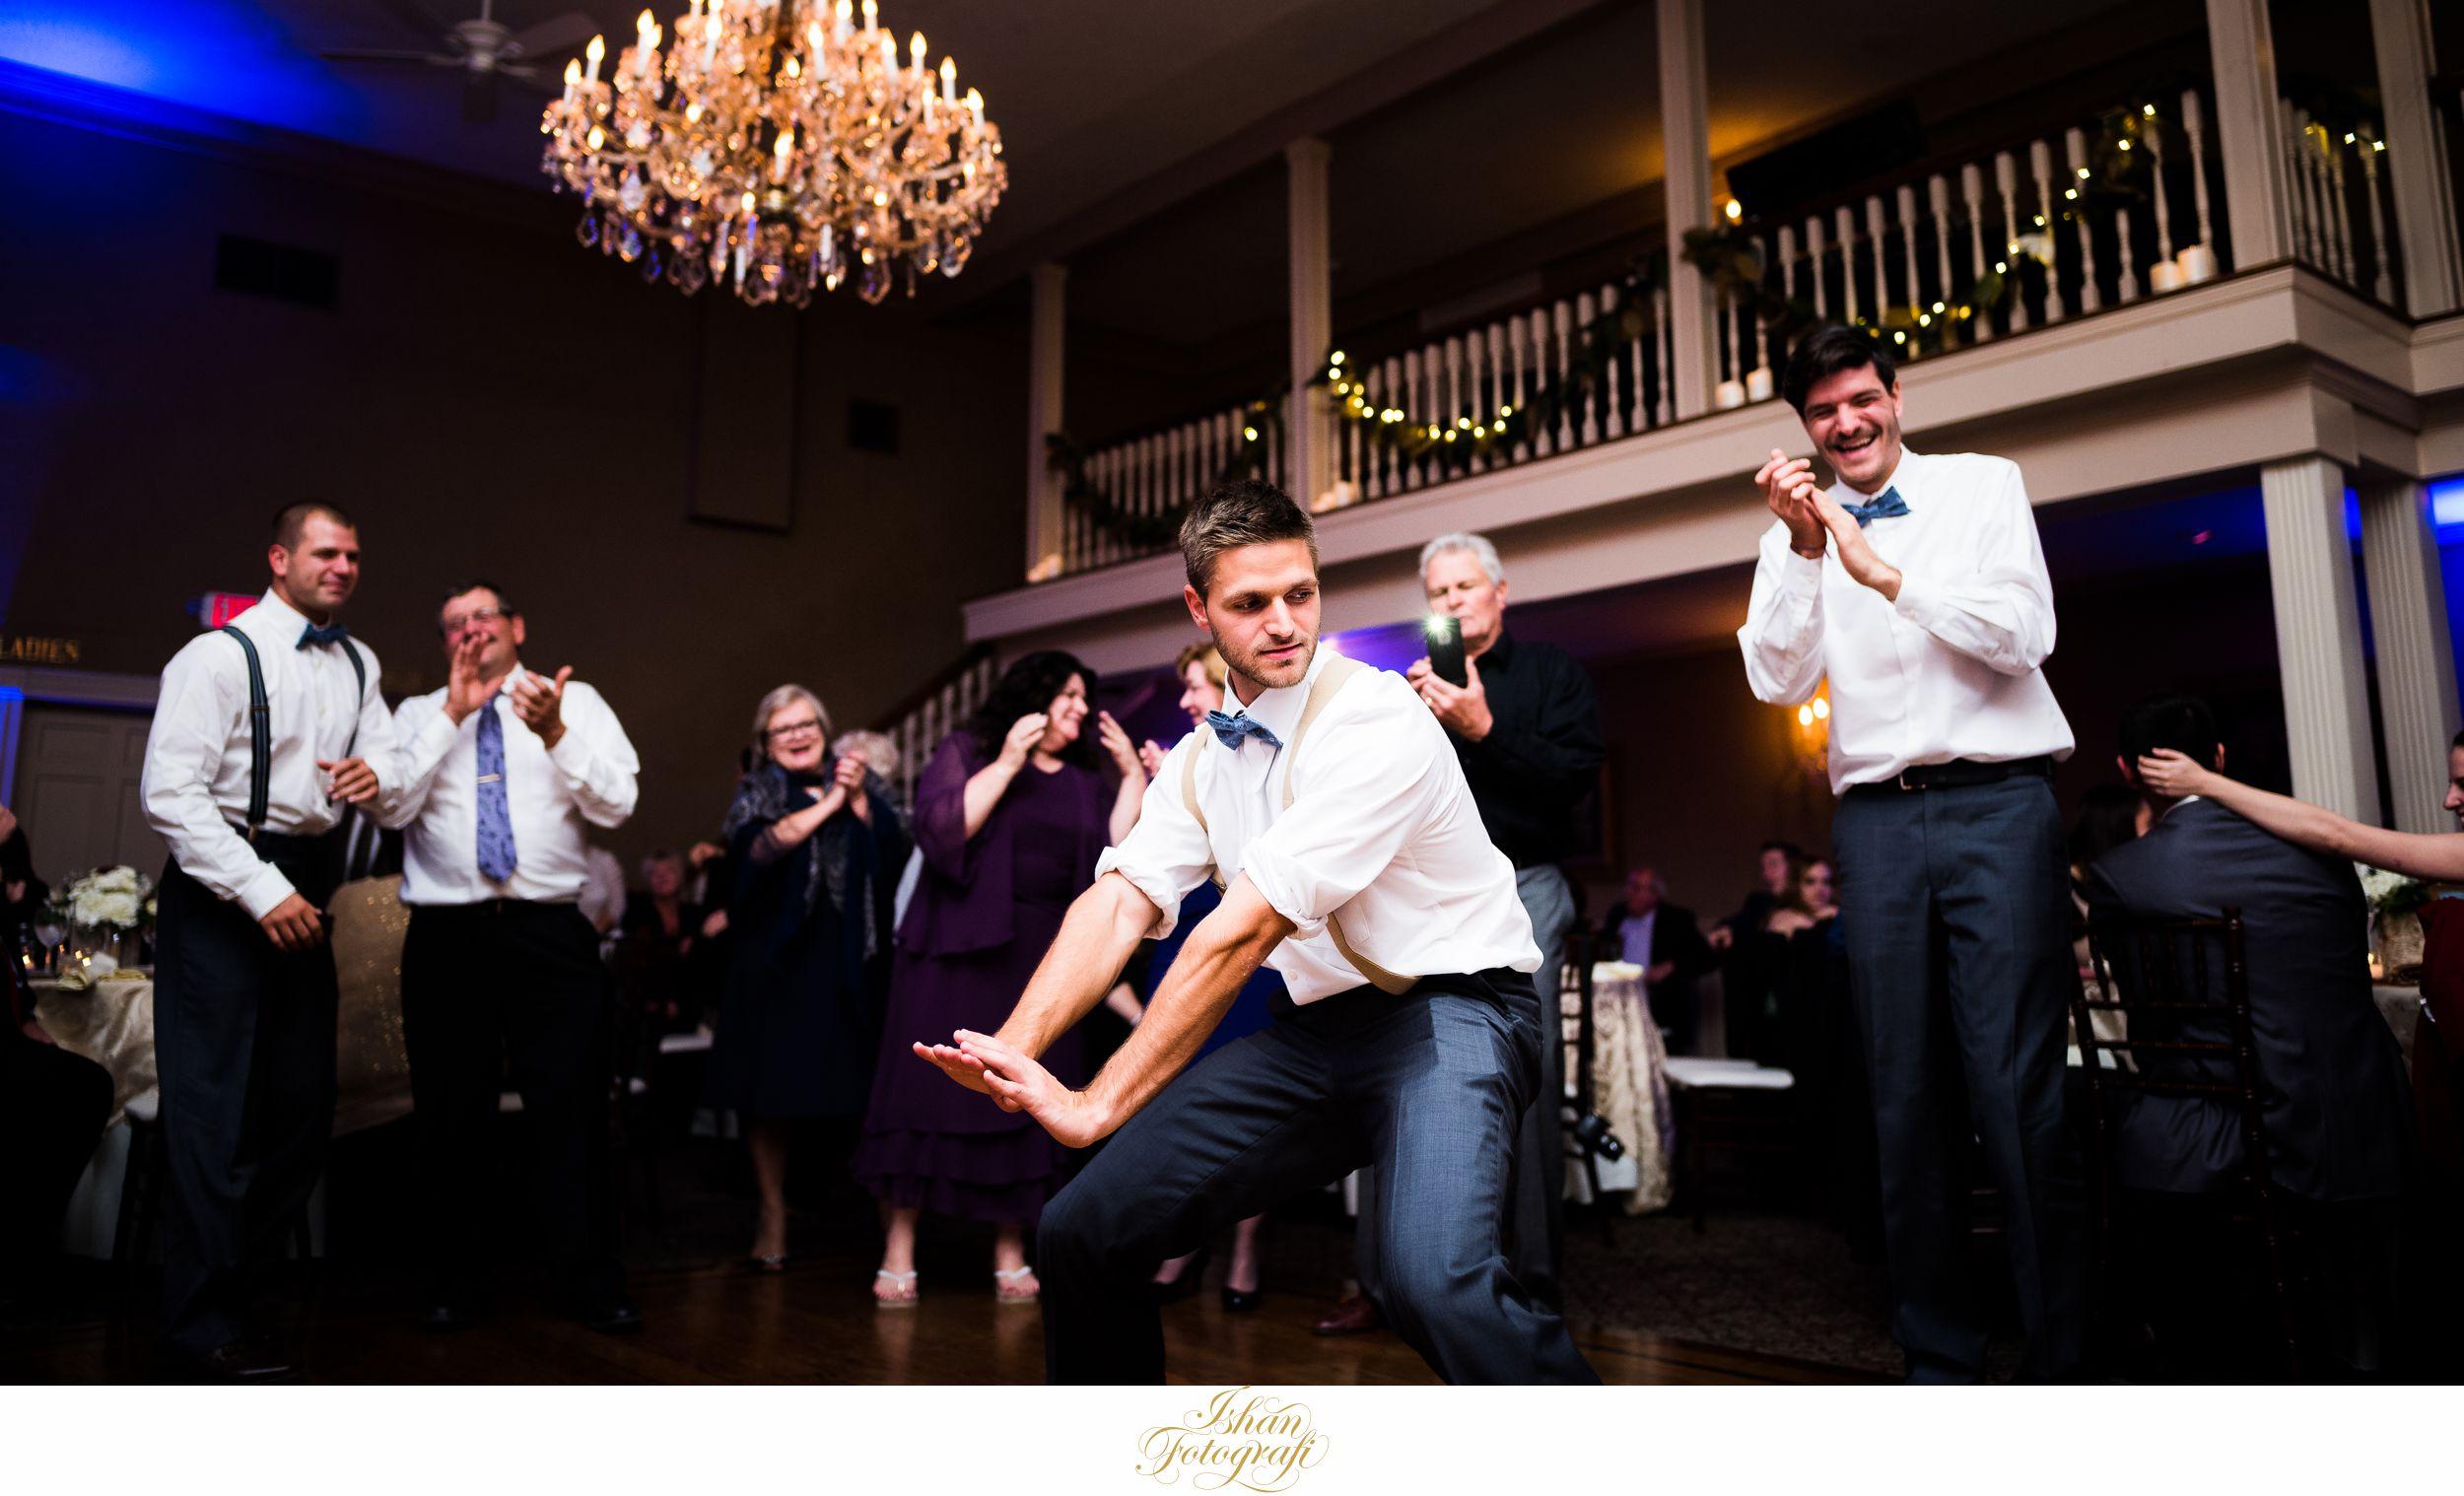 wedding-reception-photos-at-davids-country-inn